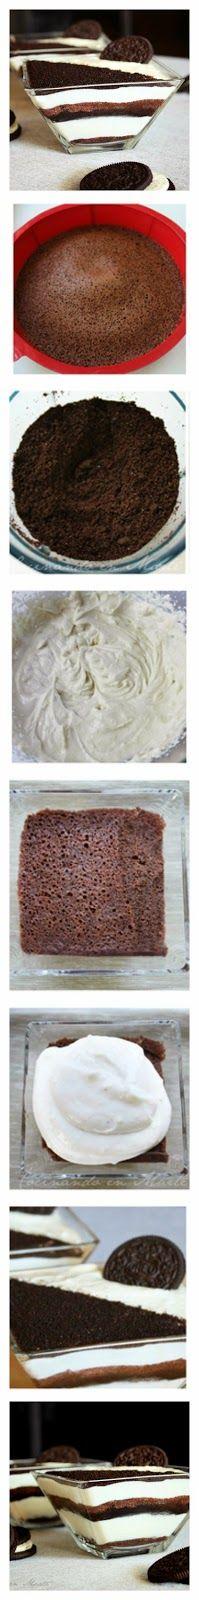 Oreo Tiramisu Recipe Tiramisu Recipe, Trifle Recipe, Desserts To Make, Delicious Desserts, Yummy Food, Cupcakes, Cupcake Cakes, Homemade Sweets, Sweet Cheeks